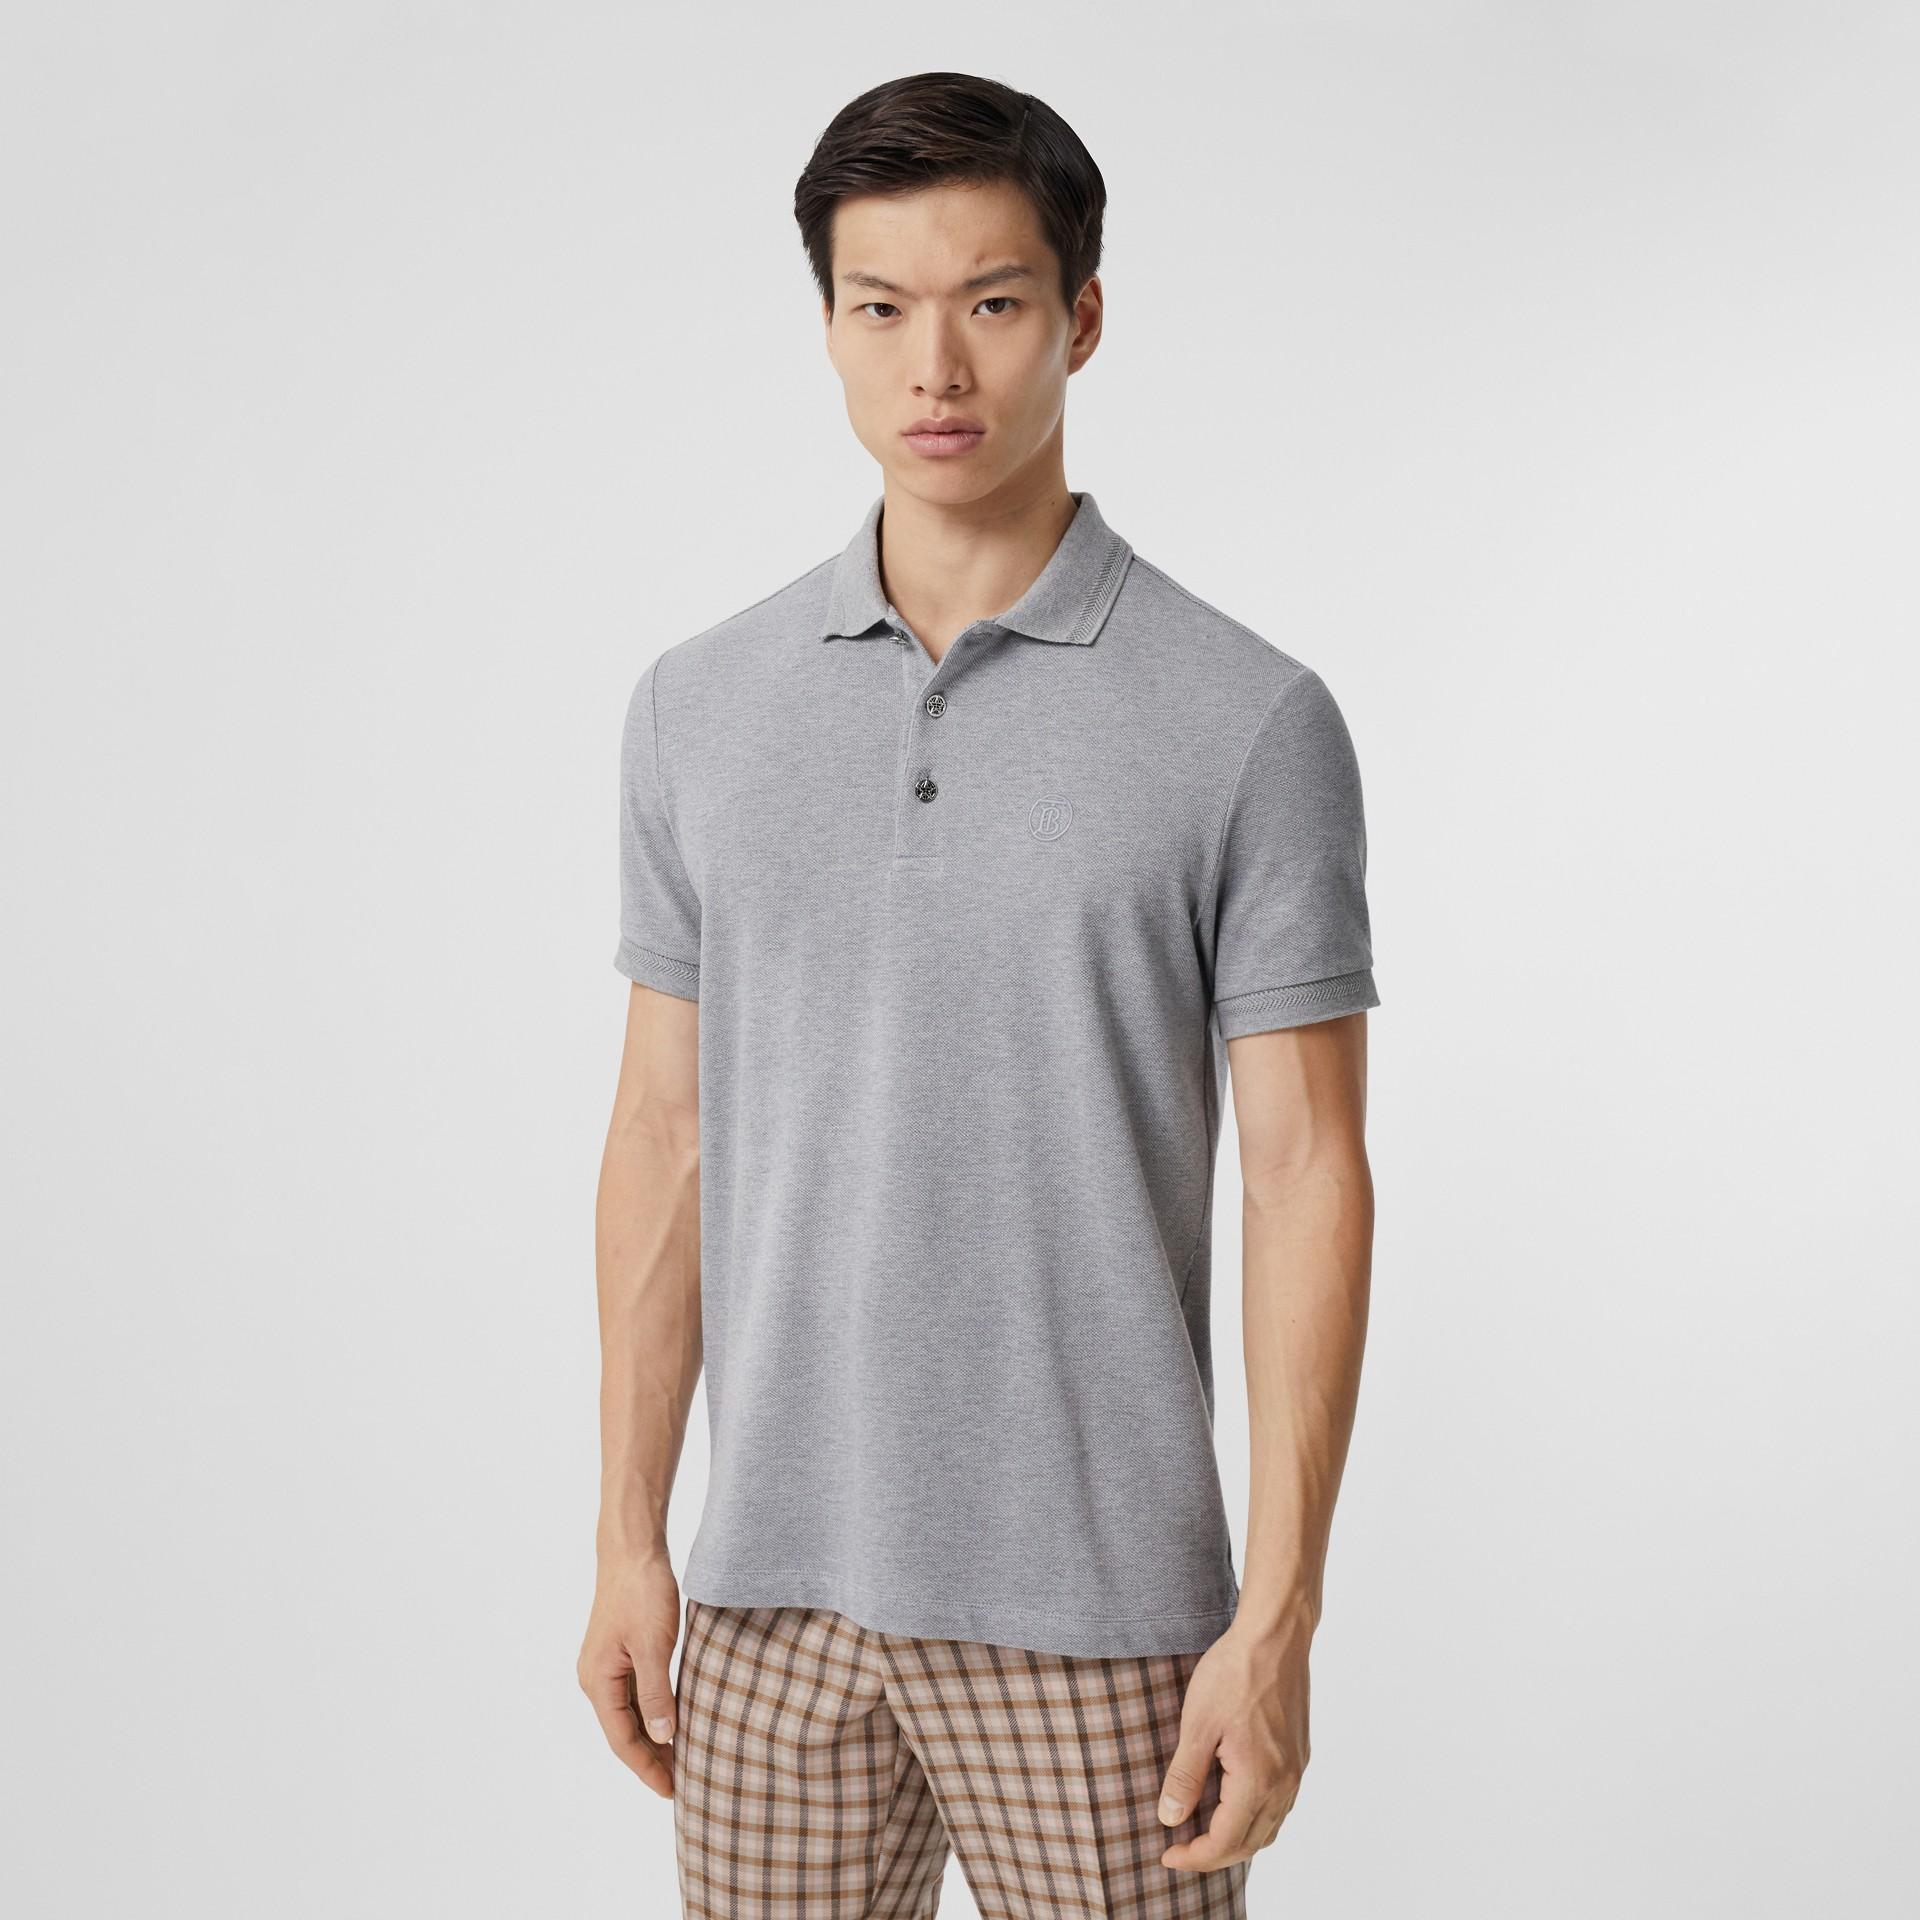 Button Detail Cotton Piqué Polo Shirt in Pale Grey Melange - Men | Burberry Canada - gallery image 0